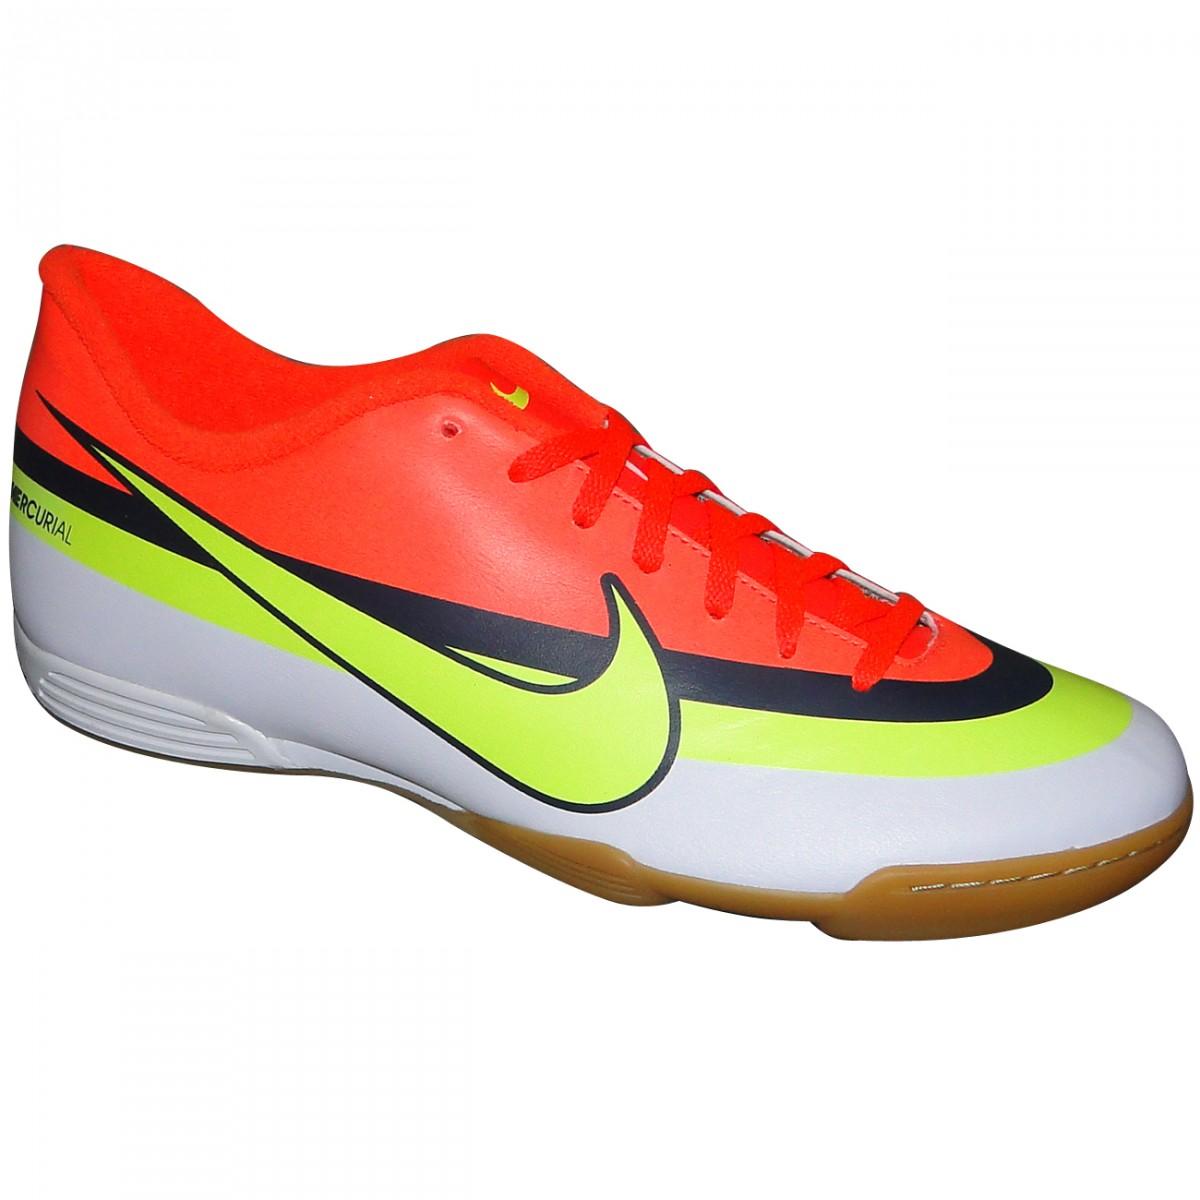 Tenis Nike Mercurial Vortex 586520-174 - Laranja Limão Branco - Chuteira  Nike 870e455f5afb1